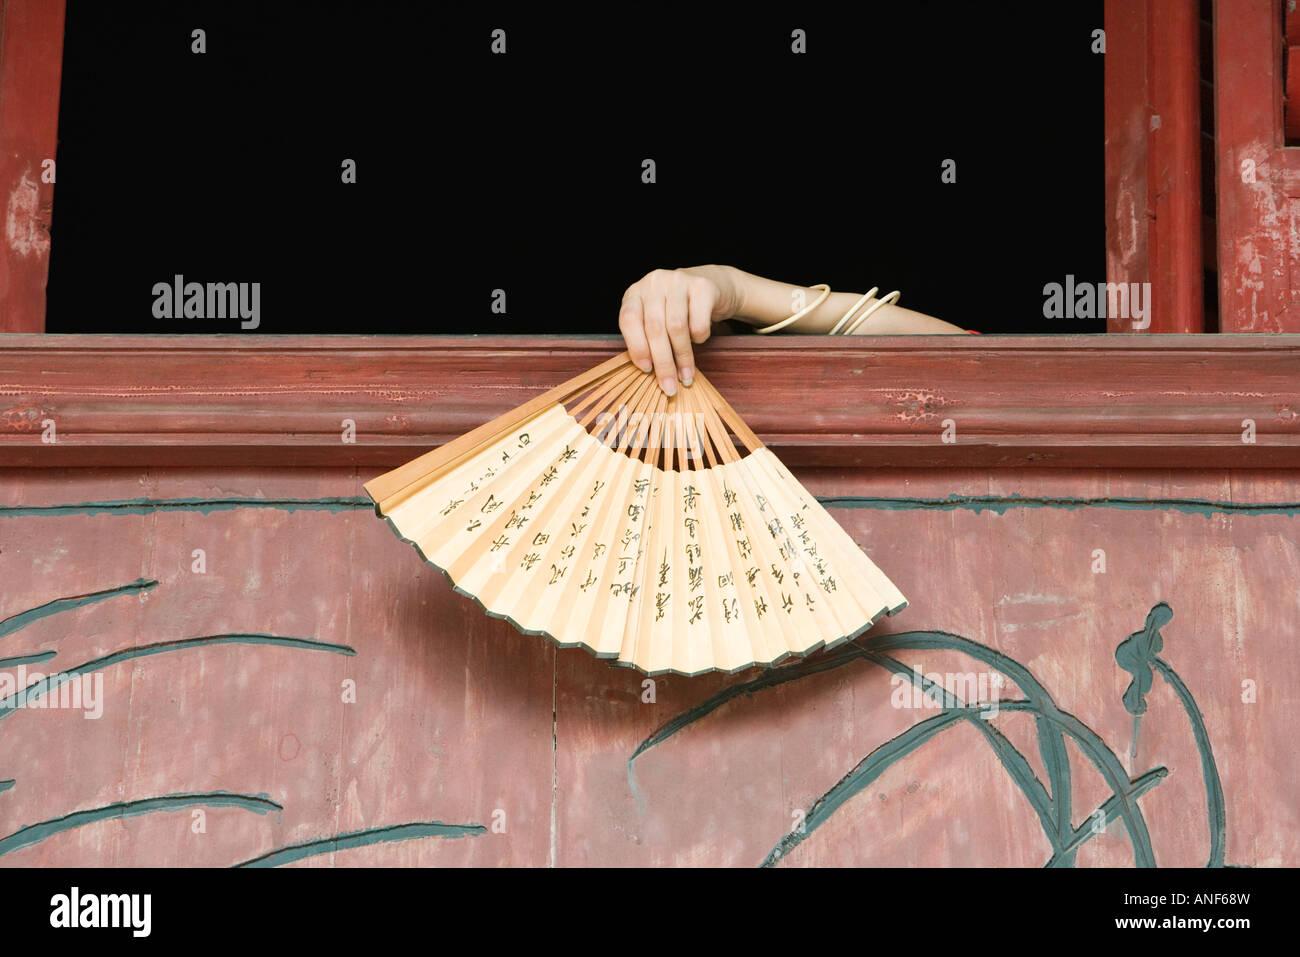 Woman's hand holding fan over edge of windowsill - Stock Image